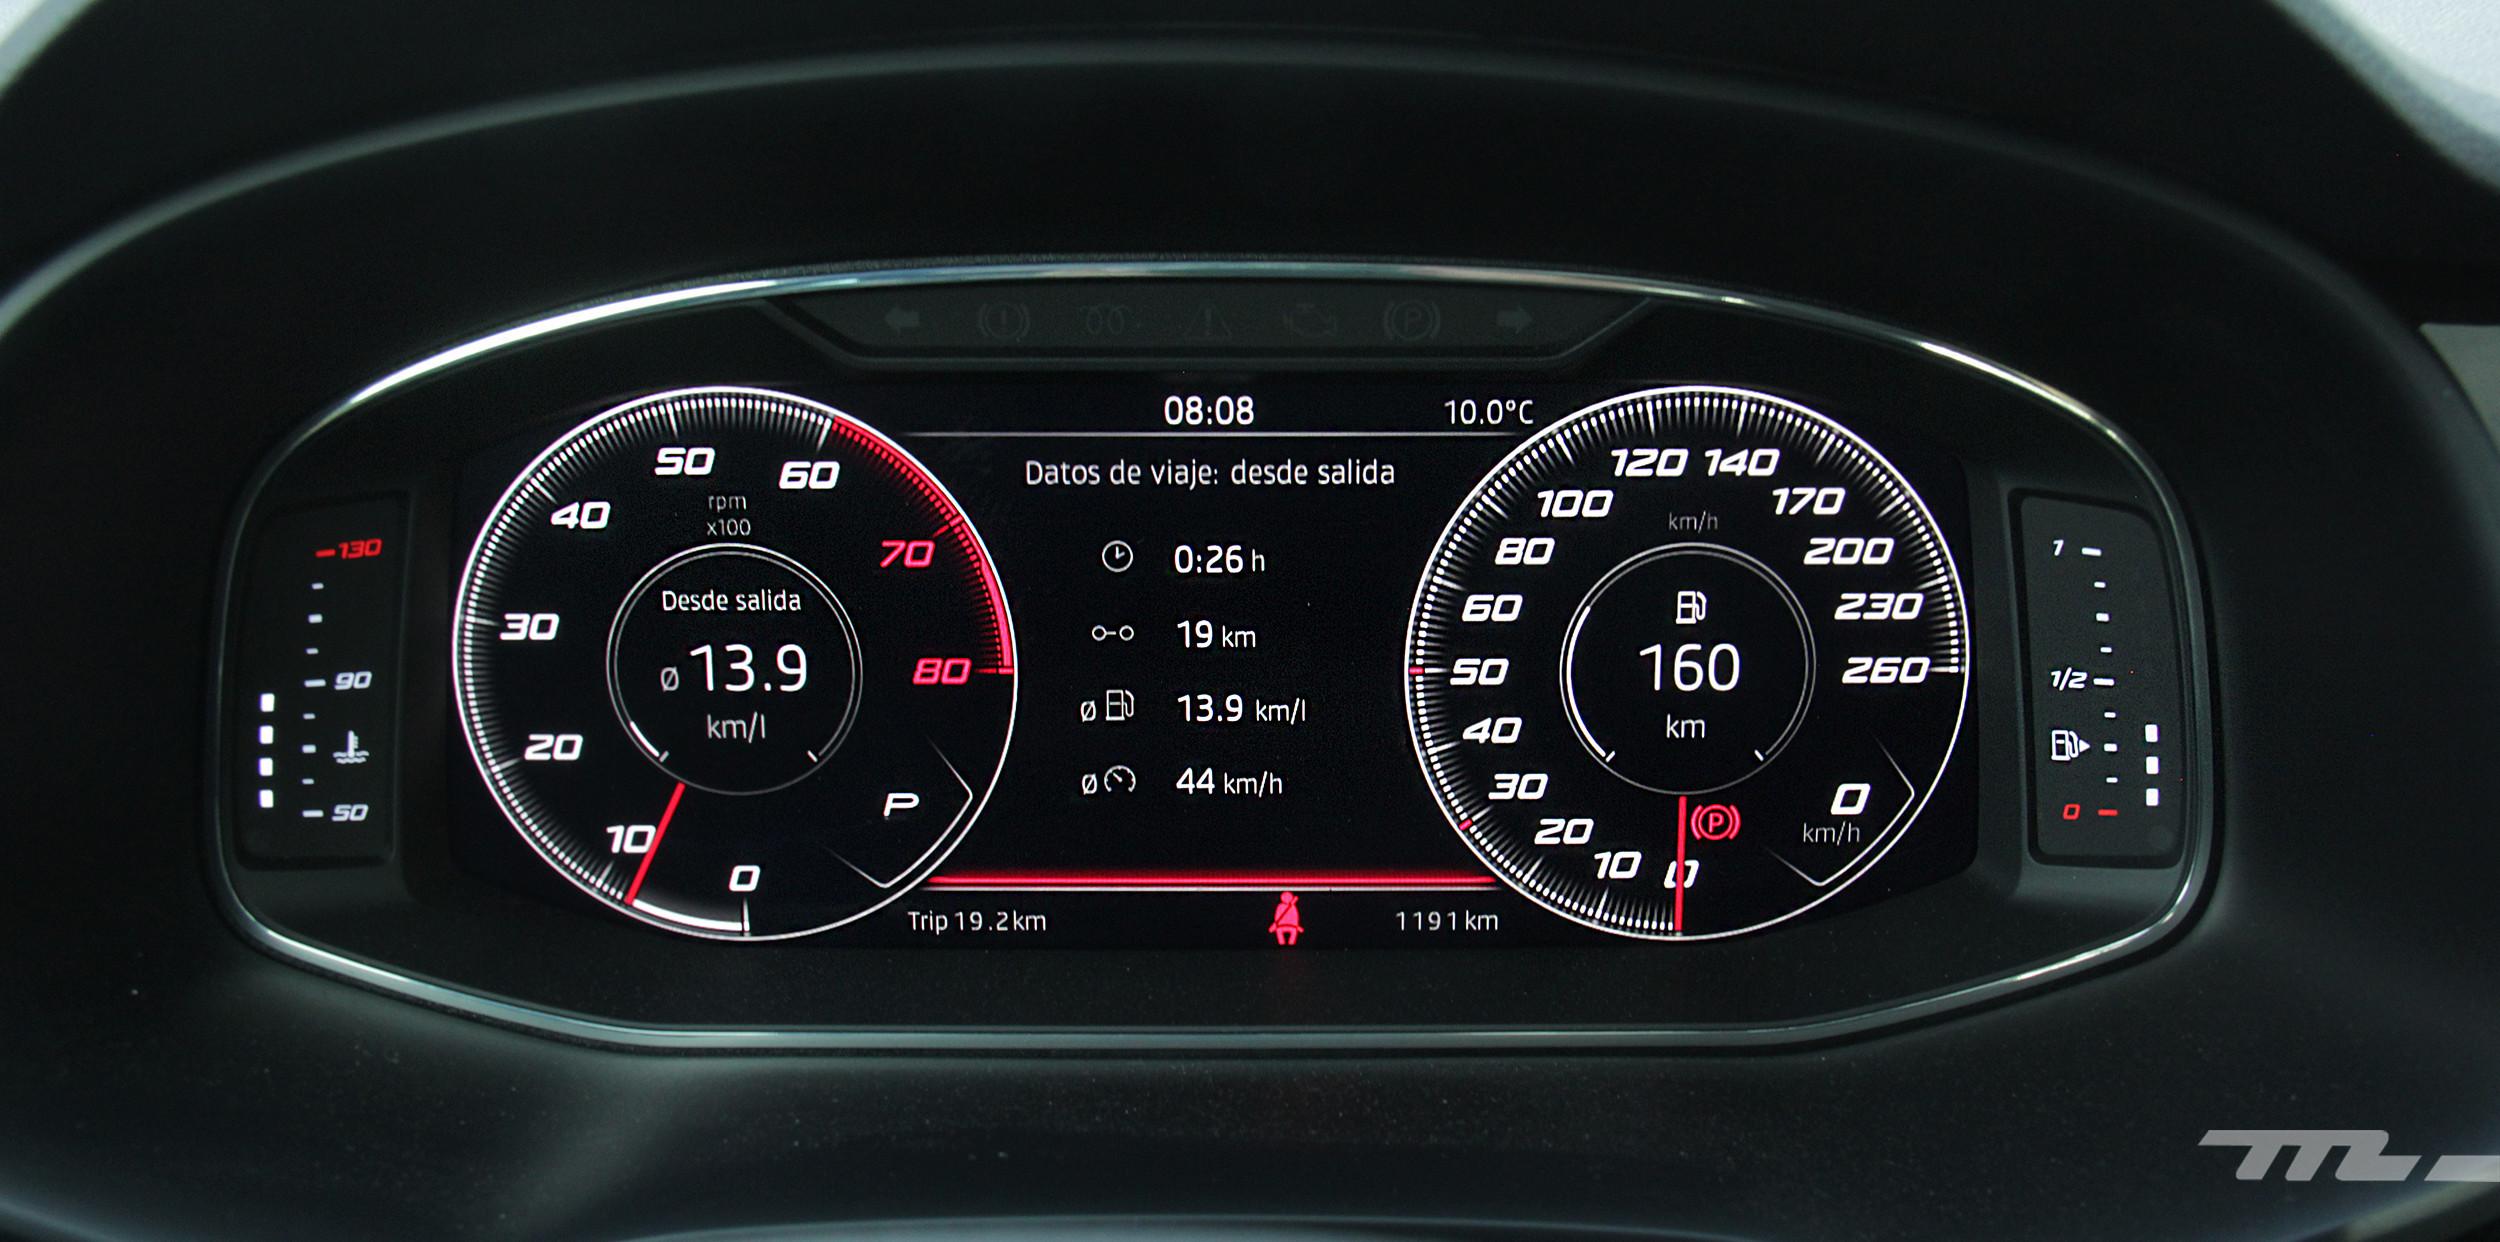 Foto de Mazda 3 vs. SEAT León (comparativa) (28/28)